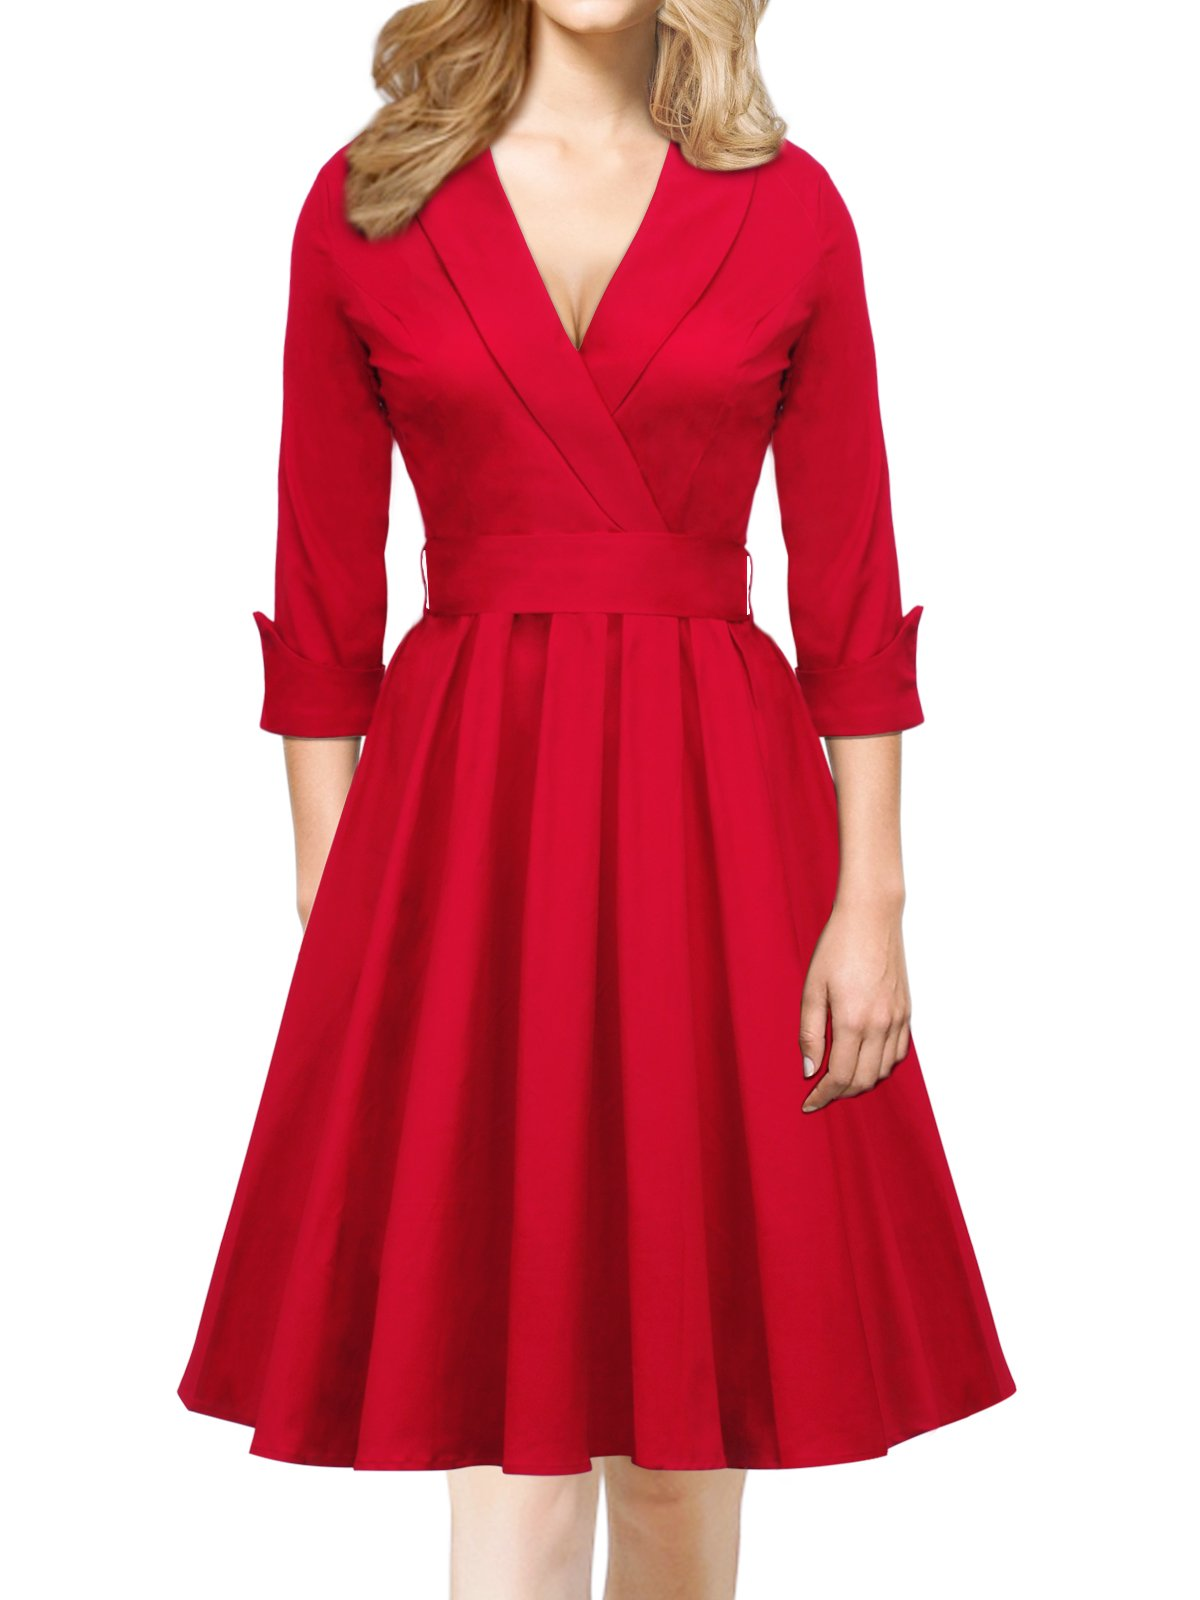 Hochzeitskleid Plus: Amazon.de